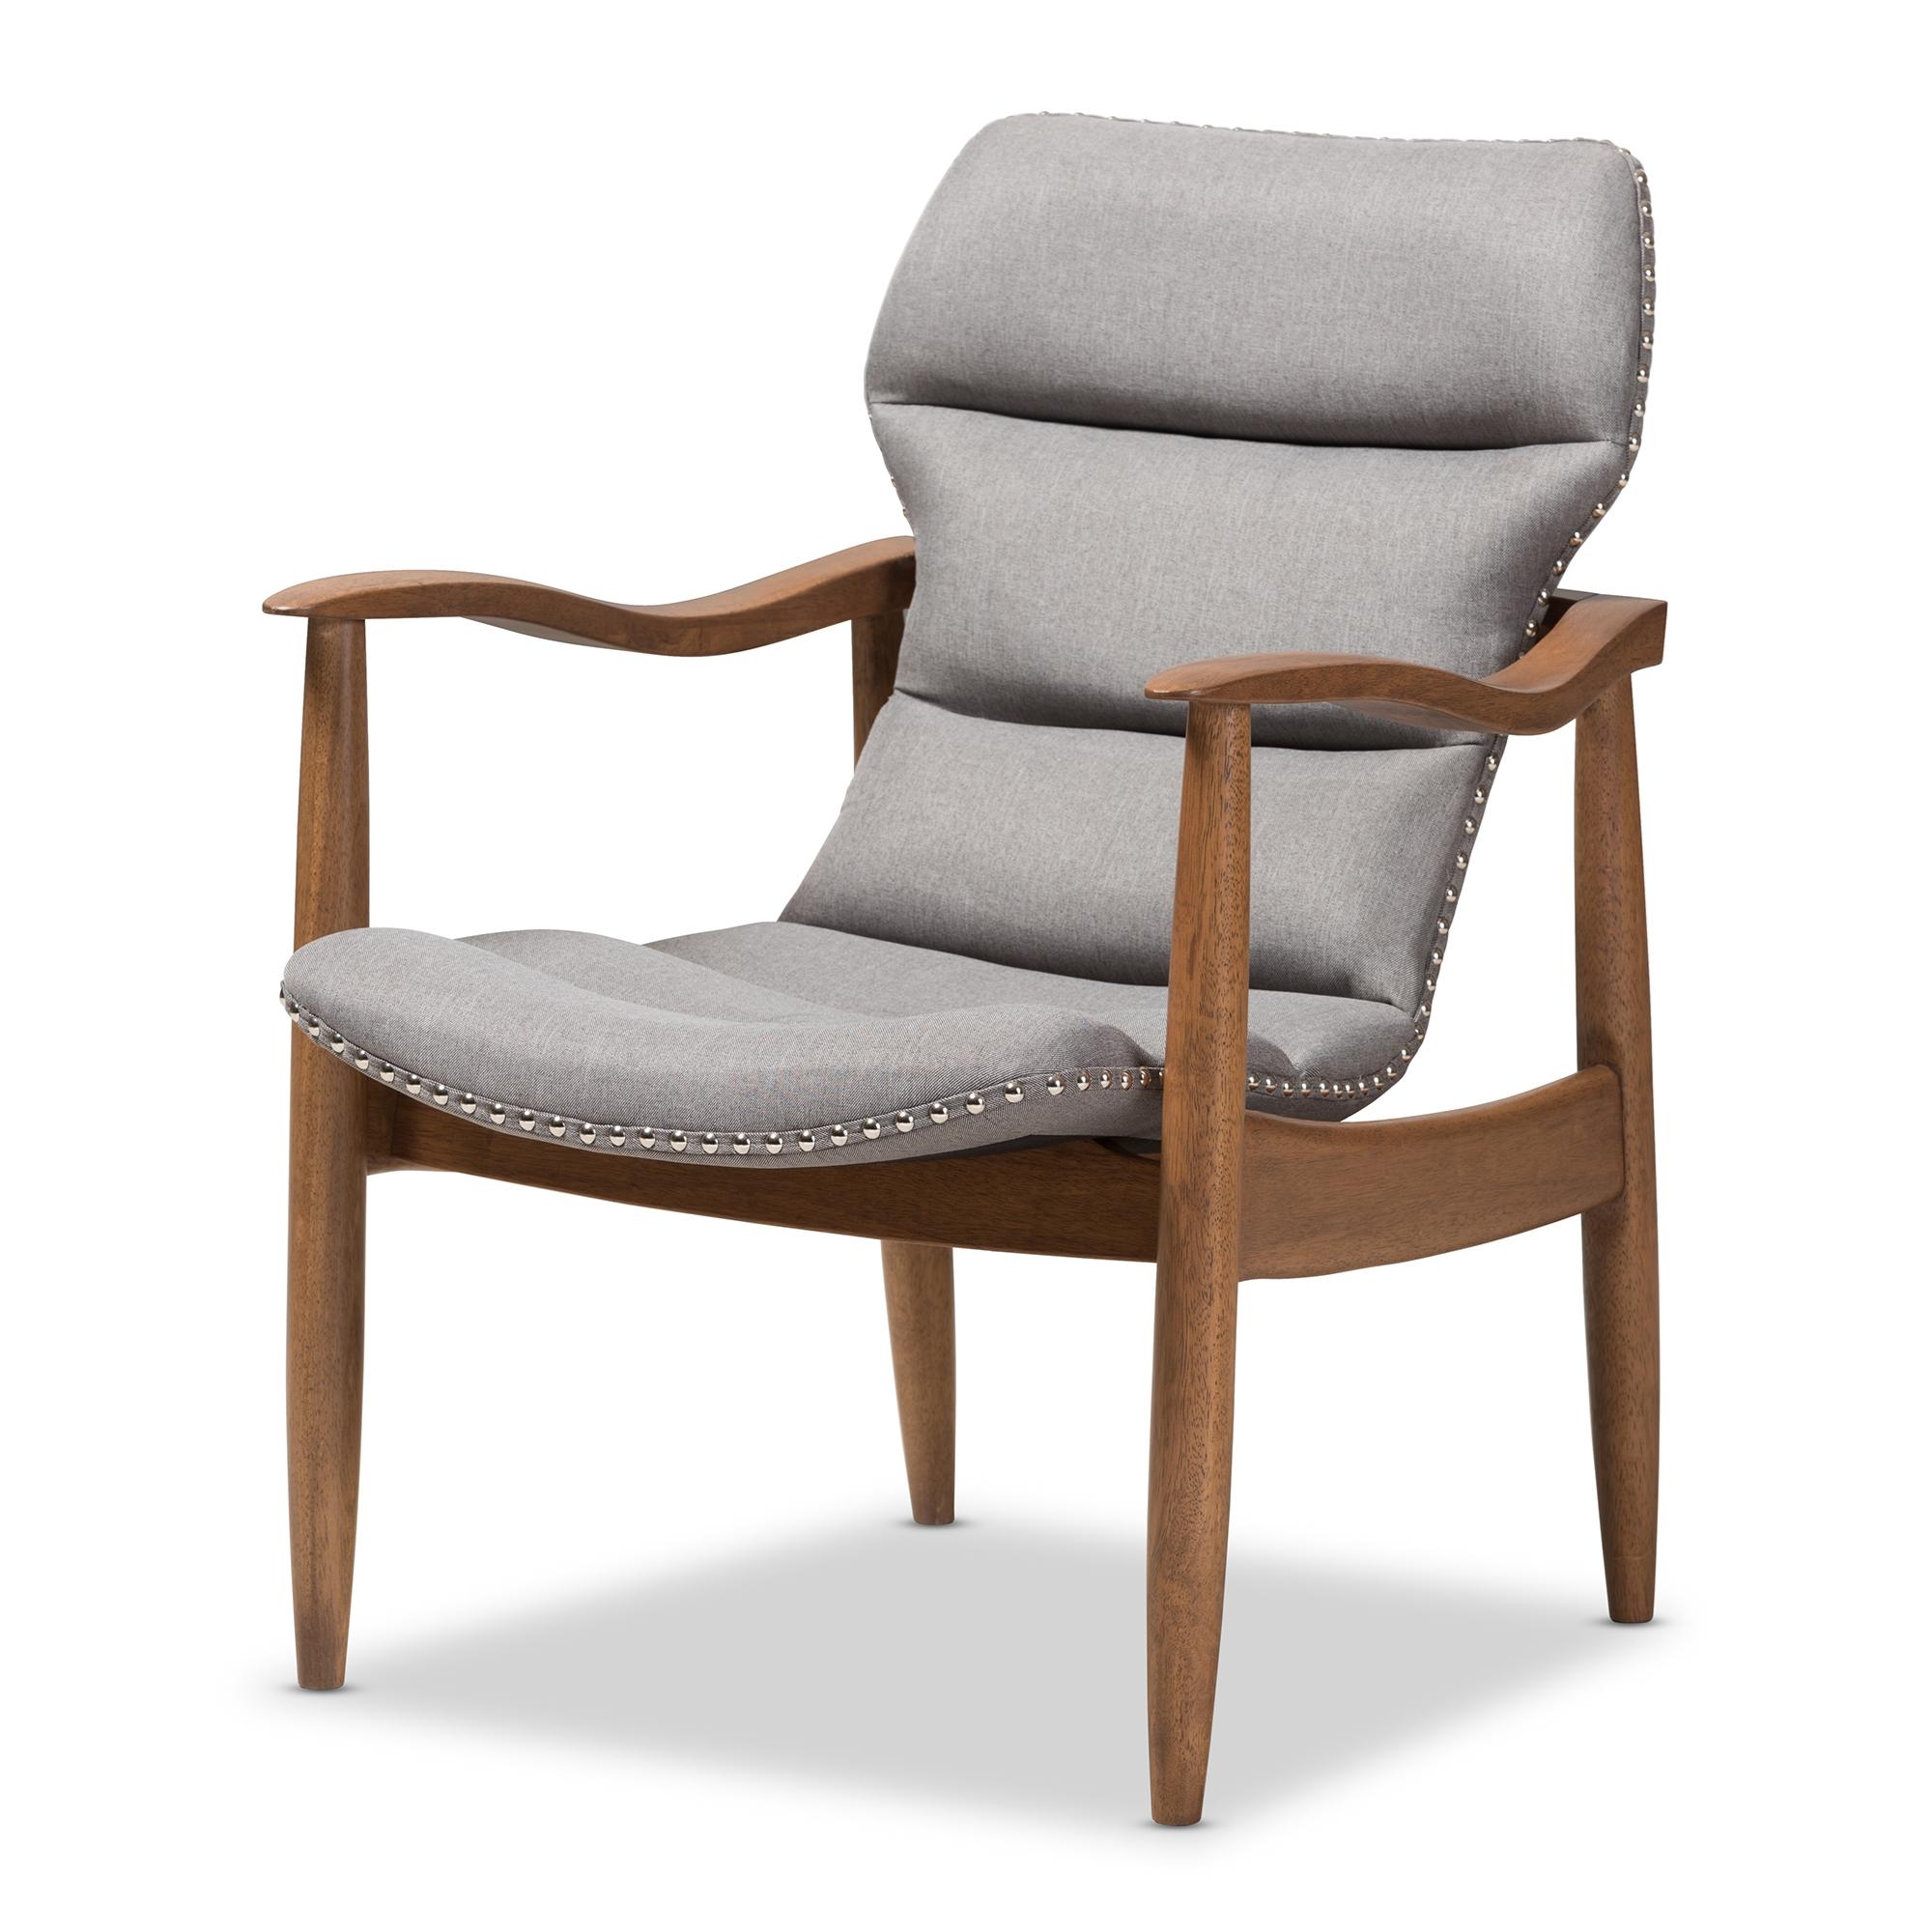 baxton studio hadley midcentury modern grey fabric and walnut brown finished wood lounge chair